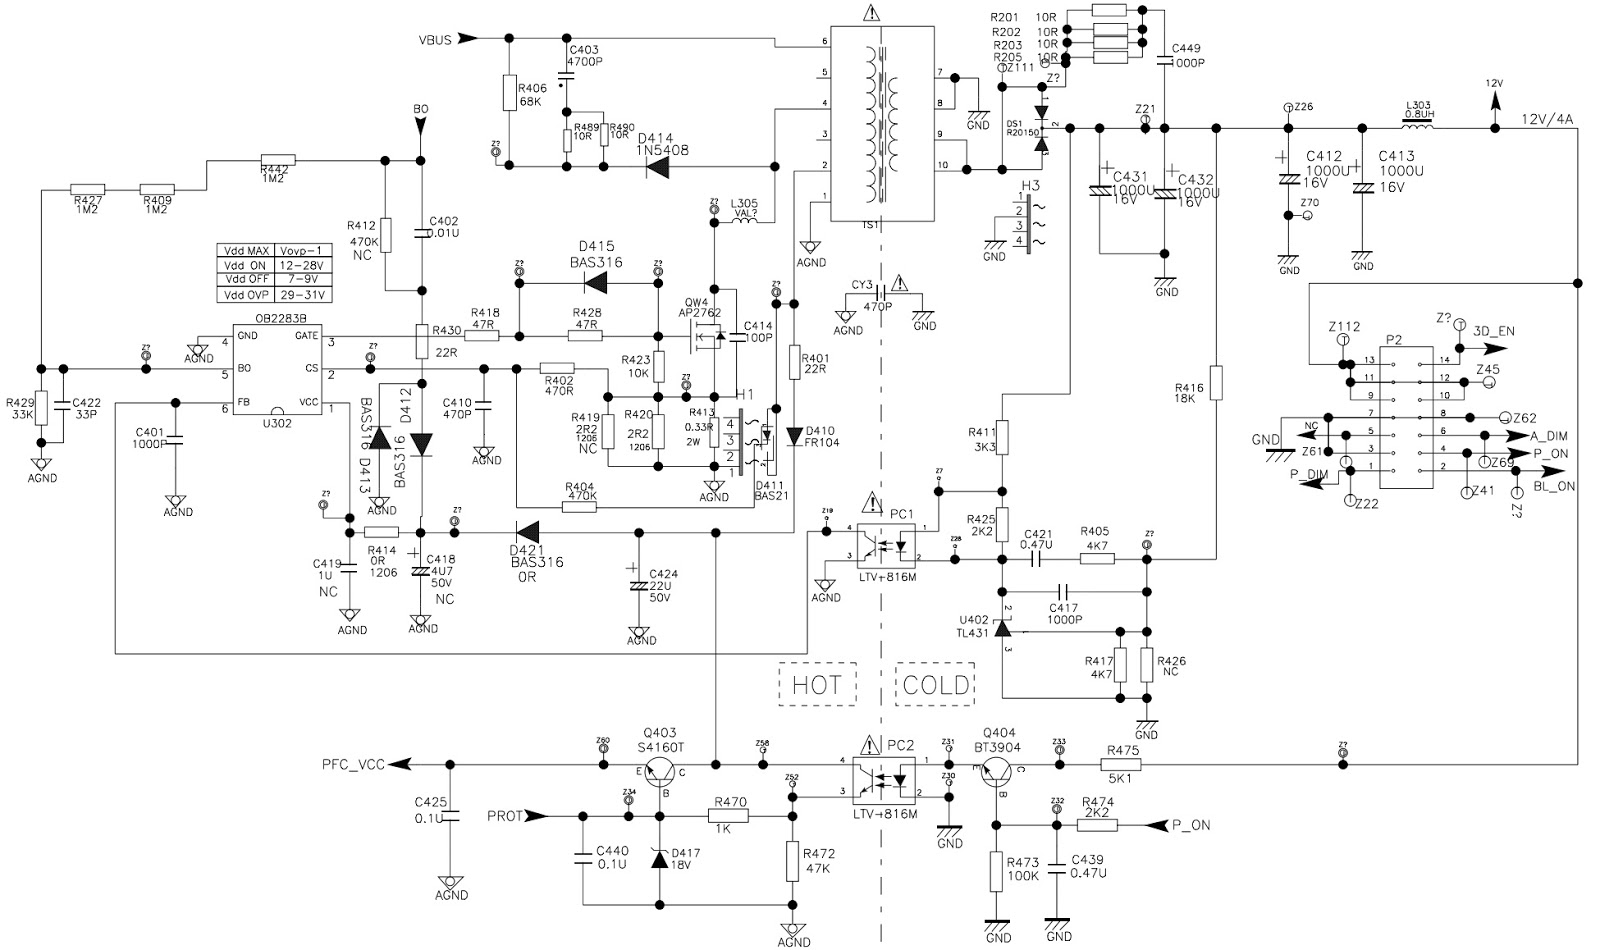 medium resolution of tcl les9b21 lcd tv power supply regulator schematic electrotricks figure 2 block diagram of an lcd tv power supply